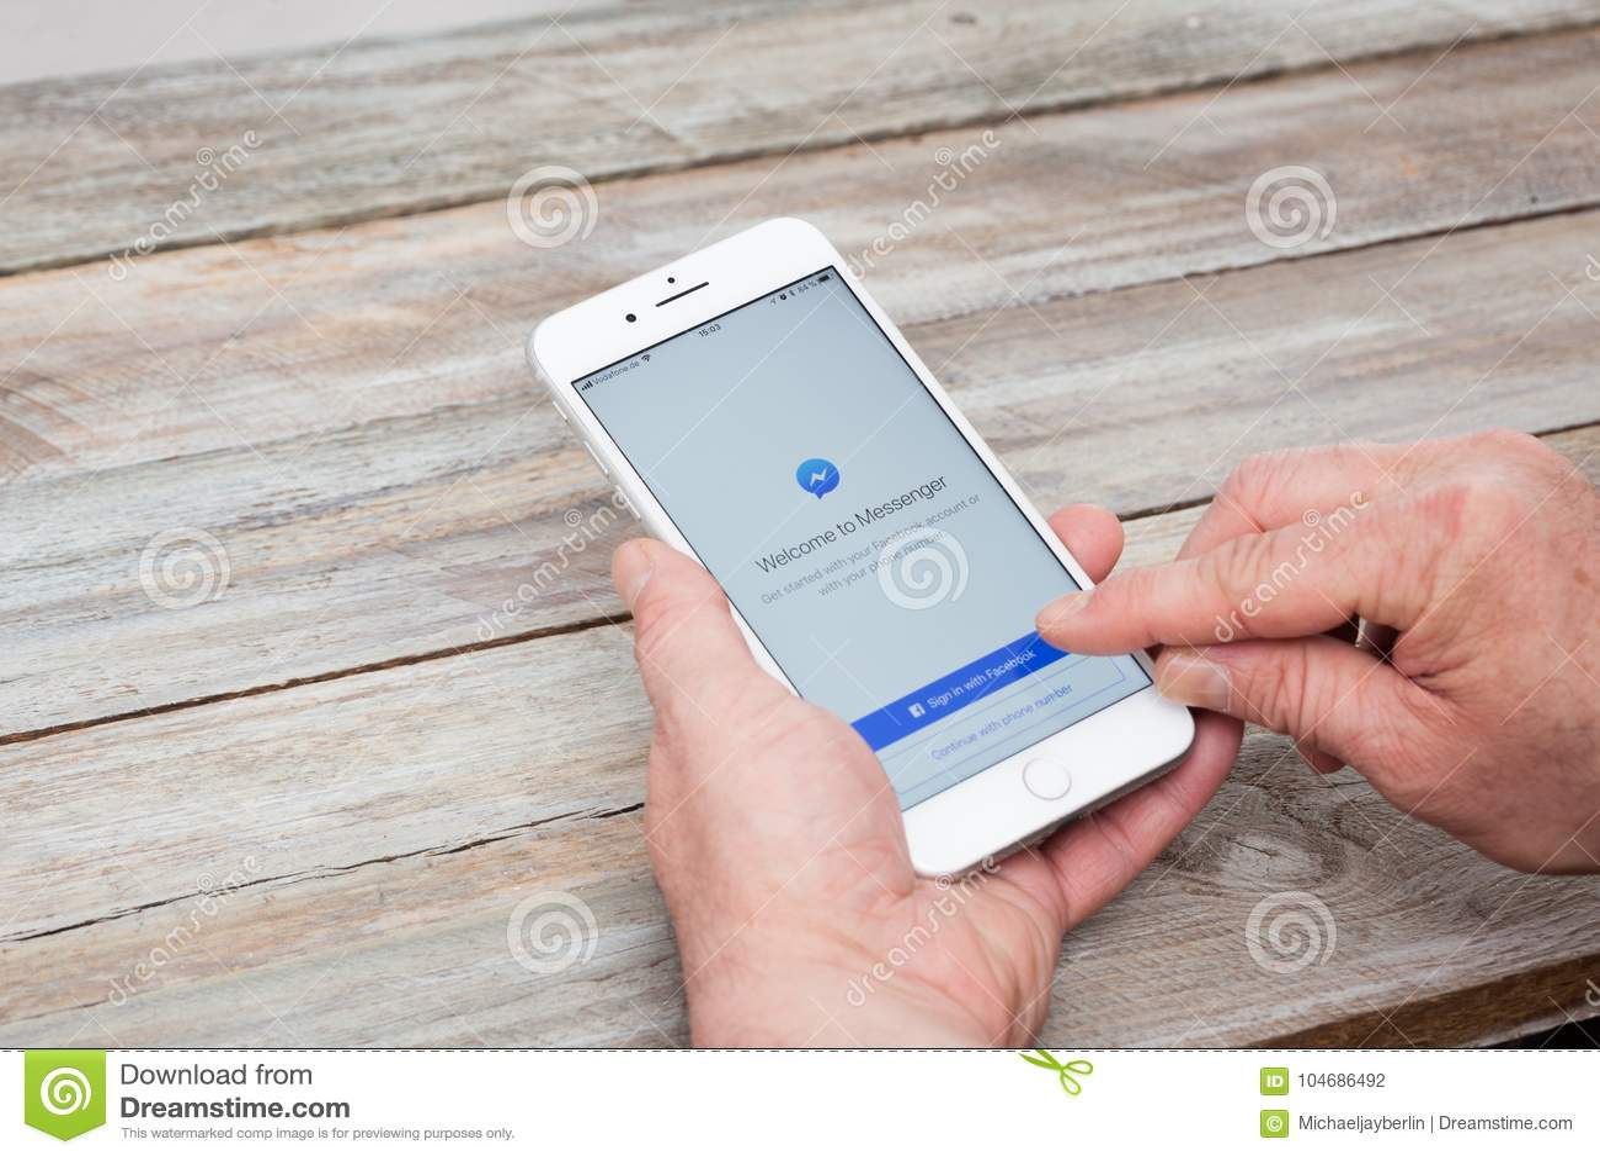 facebook login welcome to facebook 2017 download